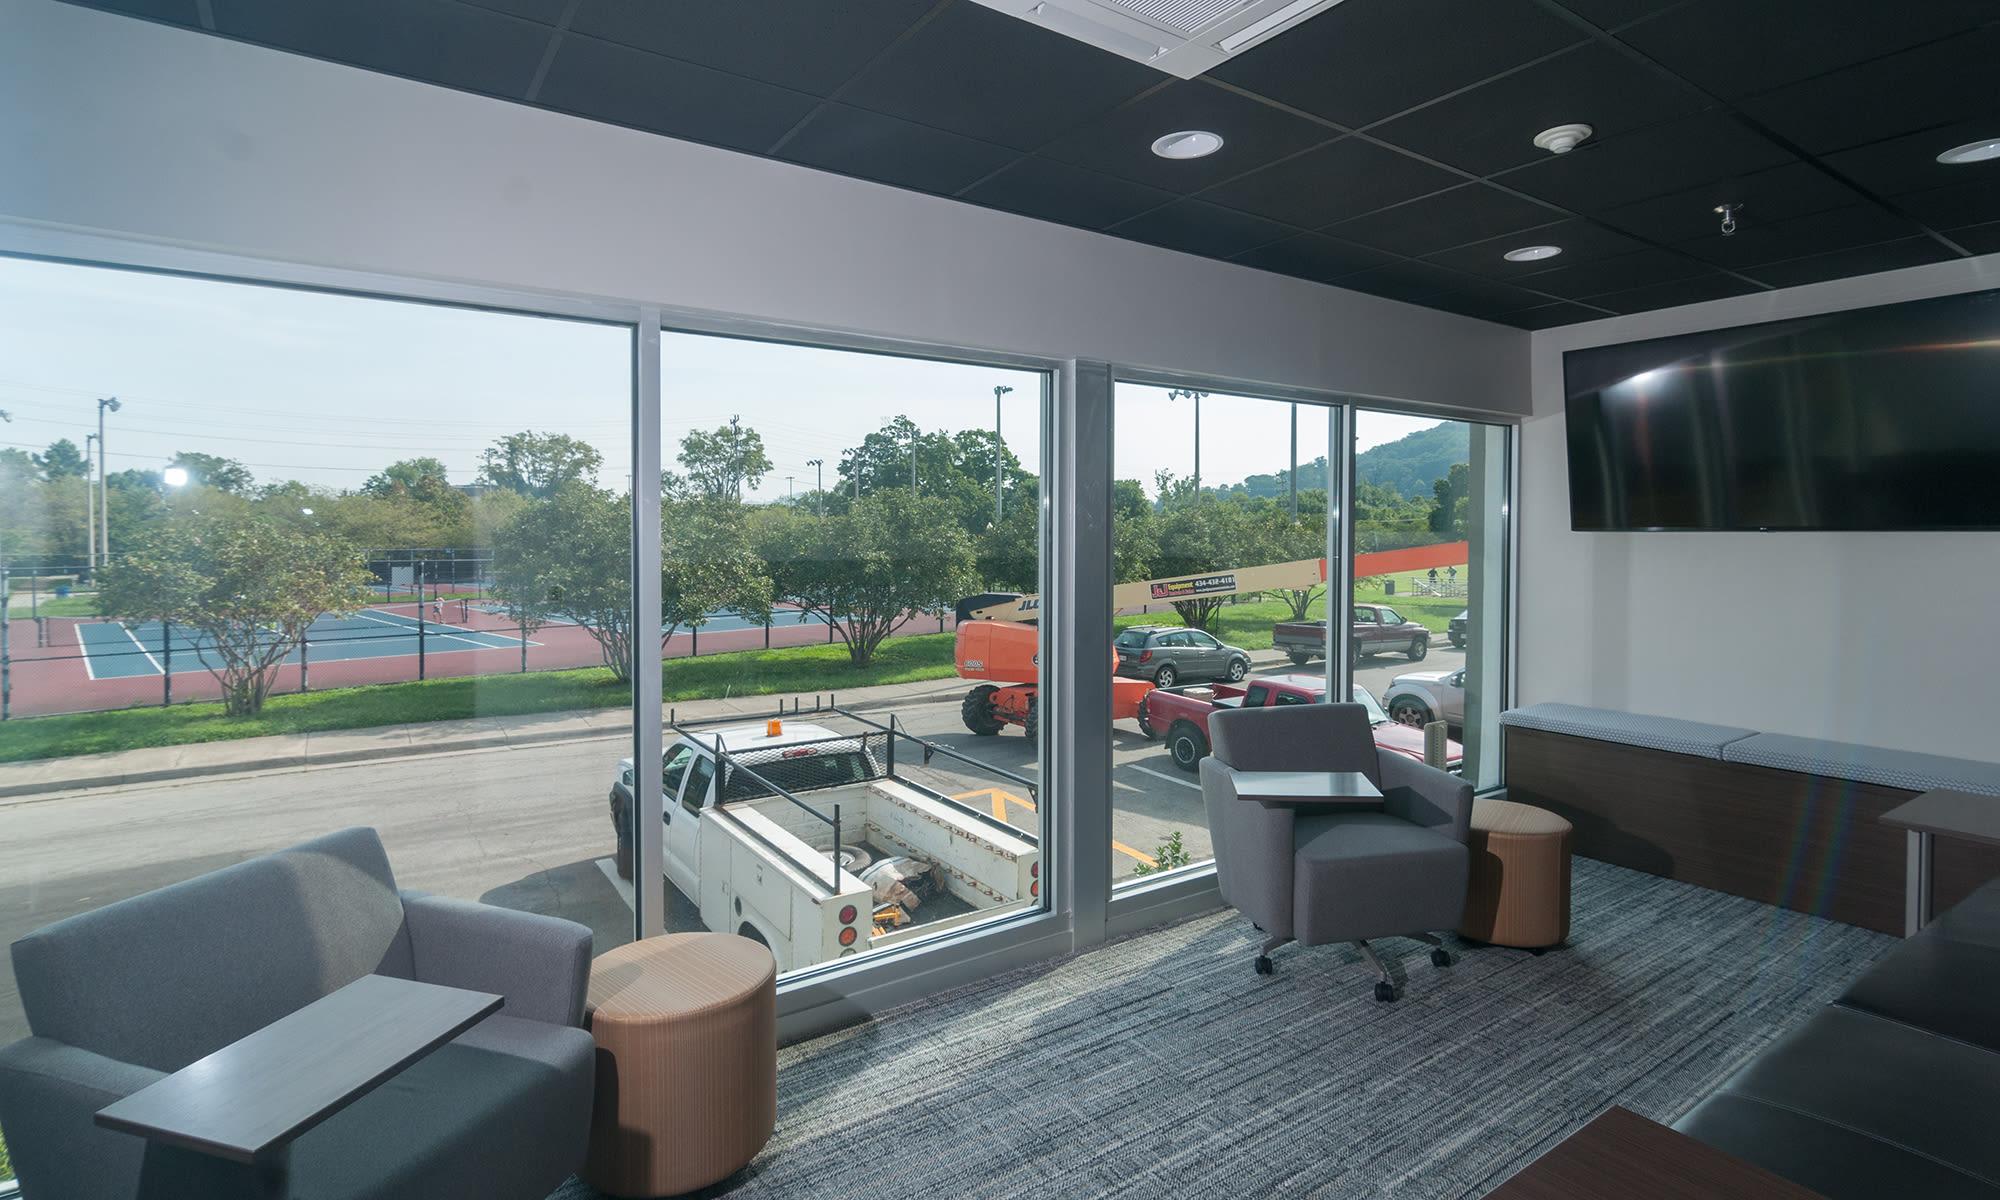 Customer Meeting Room (Centre Court) at Virginia Varsity Self Storage in Roanoke, Virginia is located